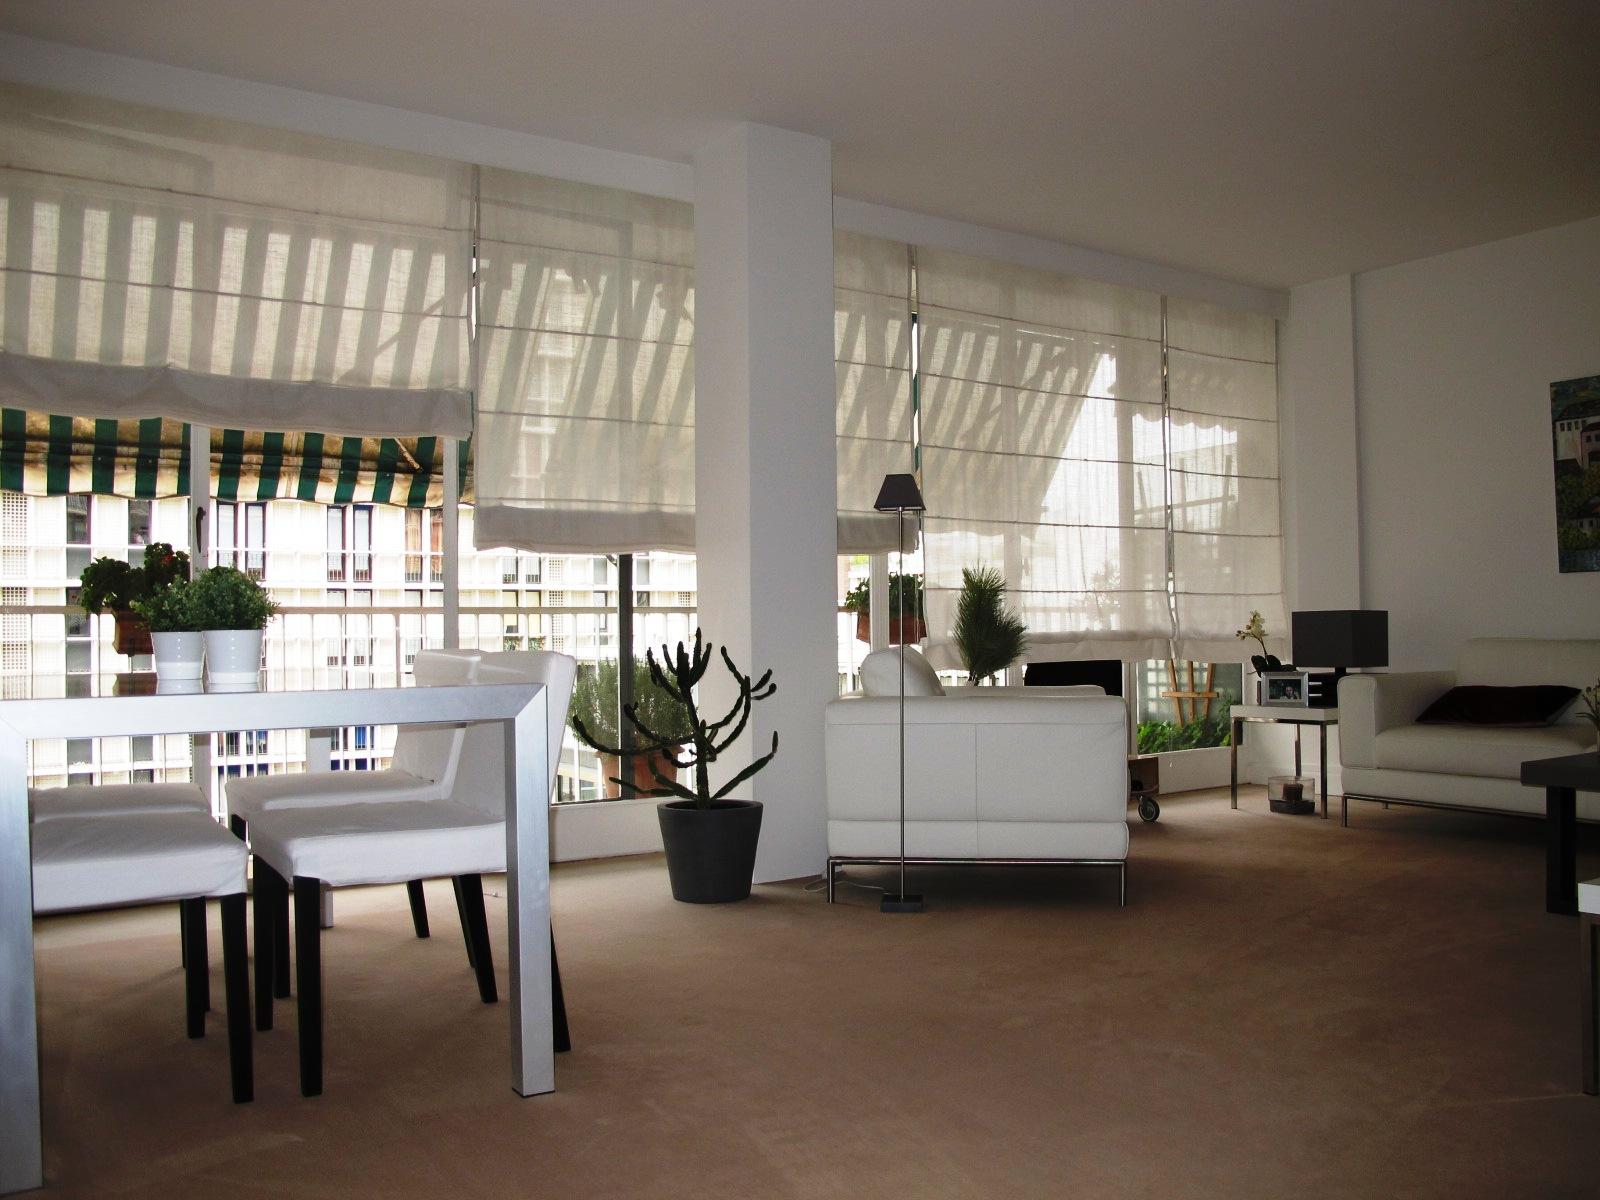 vente sous promesse de vente m tro marcel sembat 5 pi ces balcon vendre. Black Bedroom Furniture Sets. Home Design Ideas